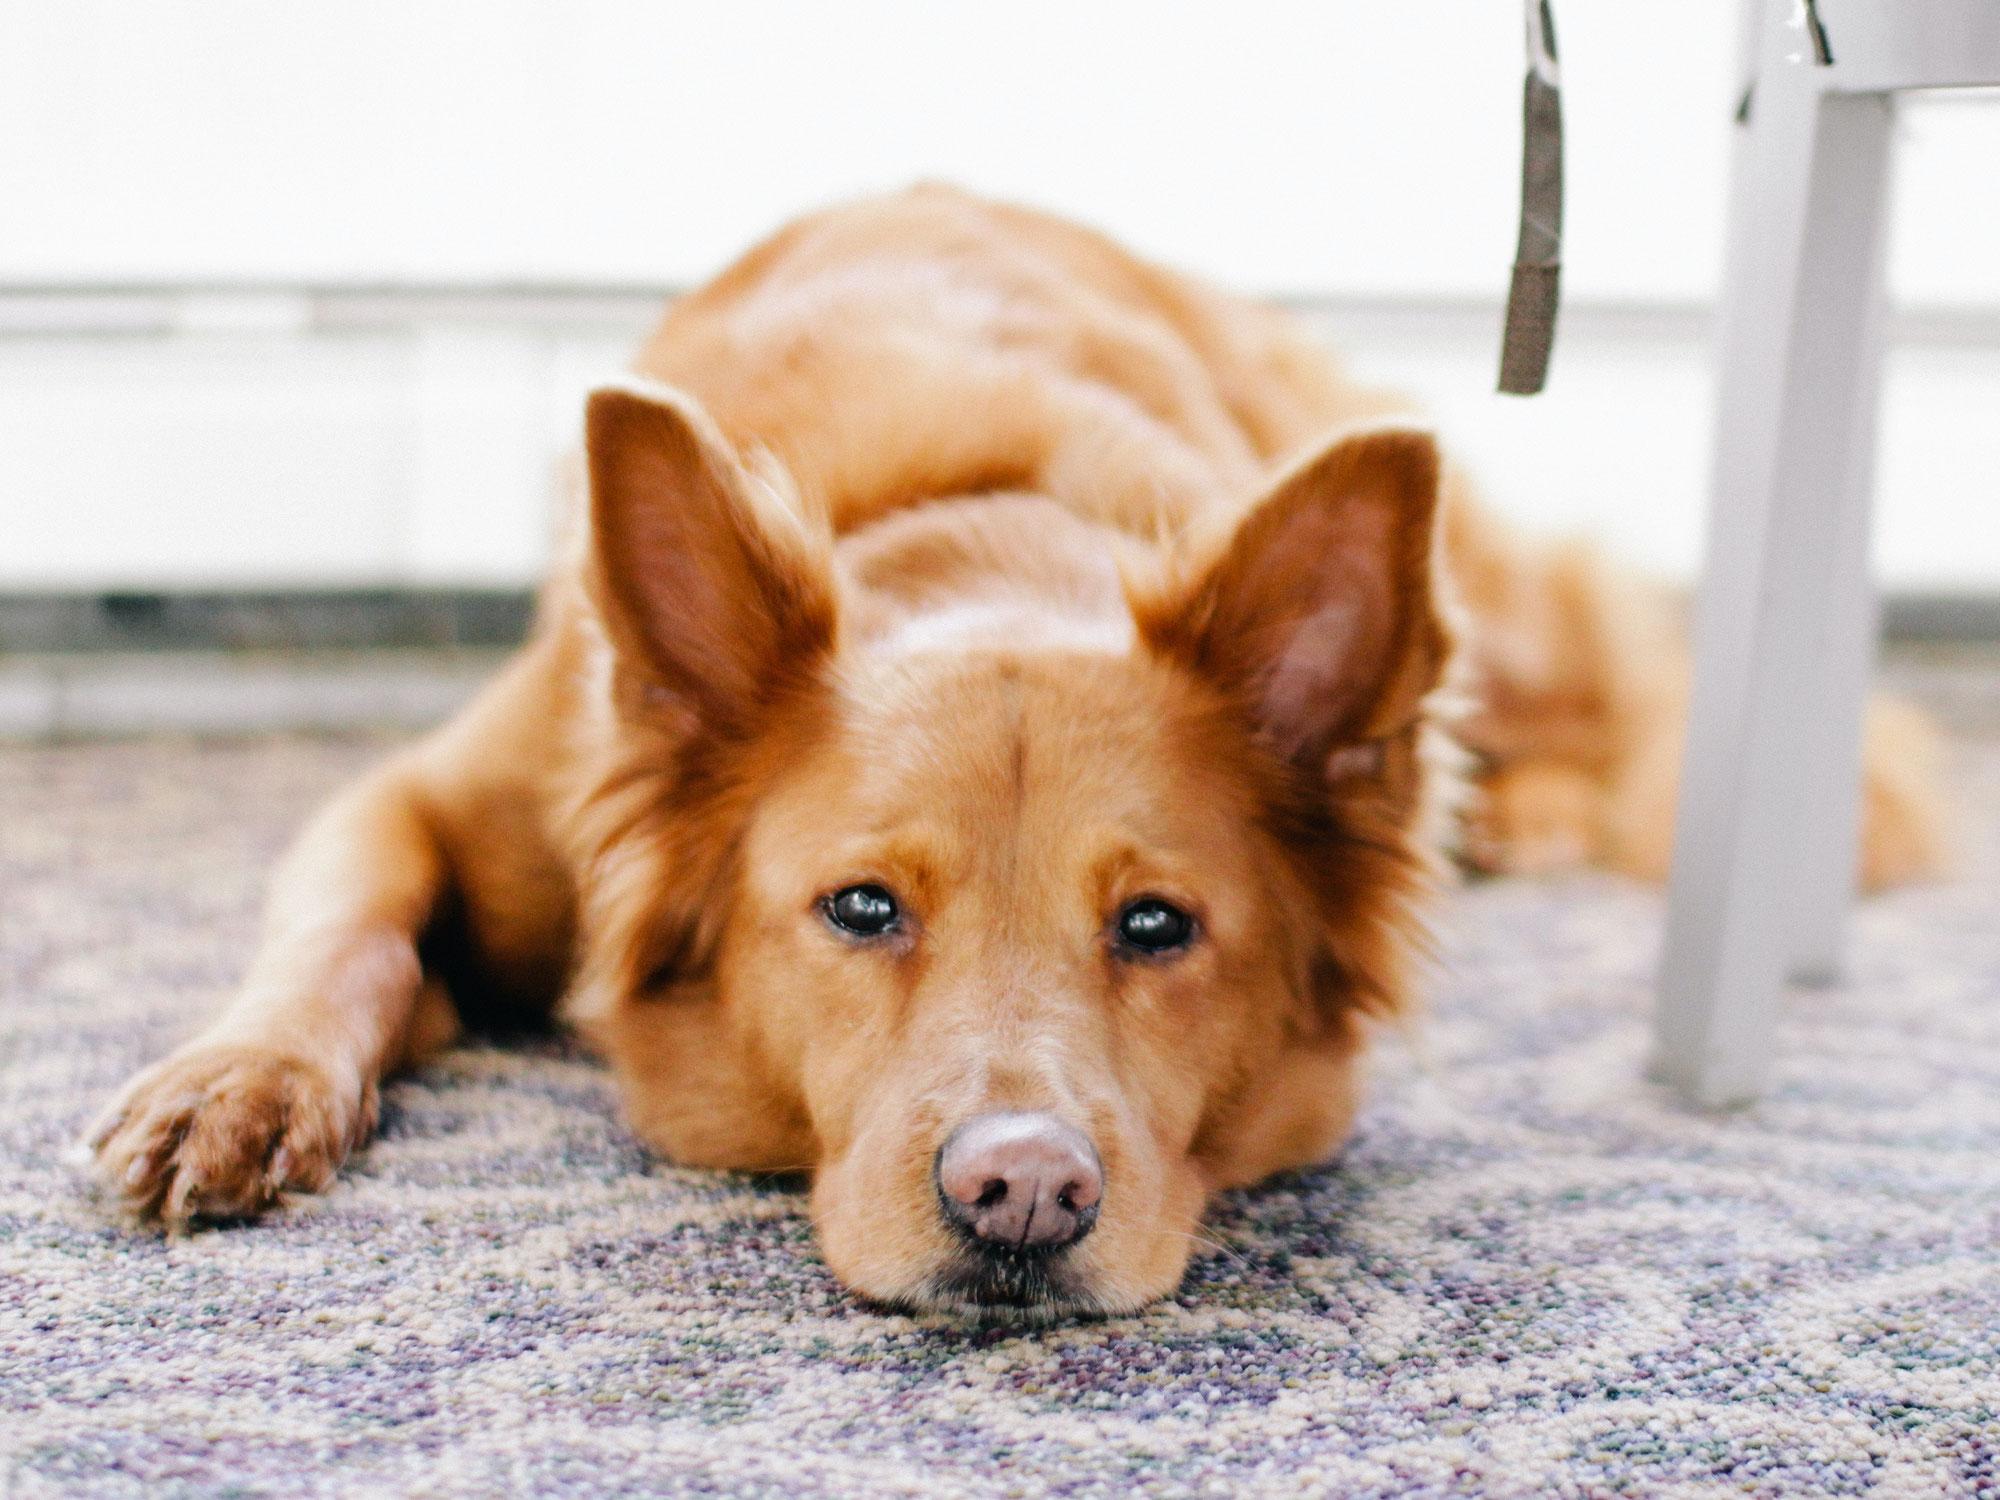 Hundekot - sauber ist schöner